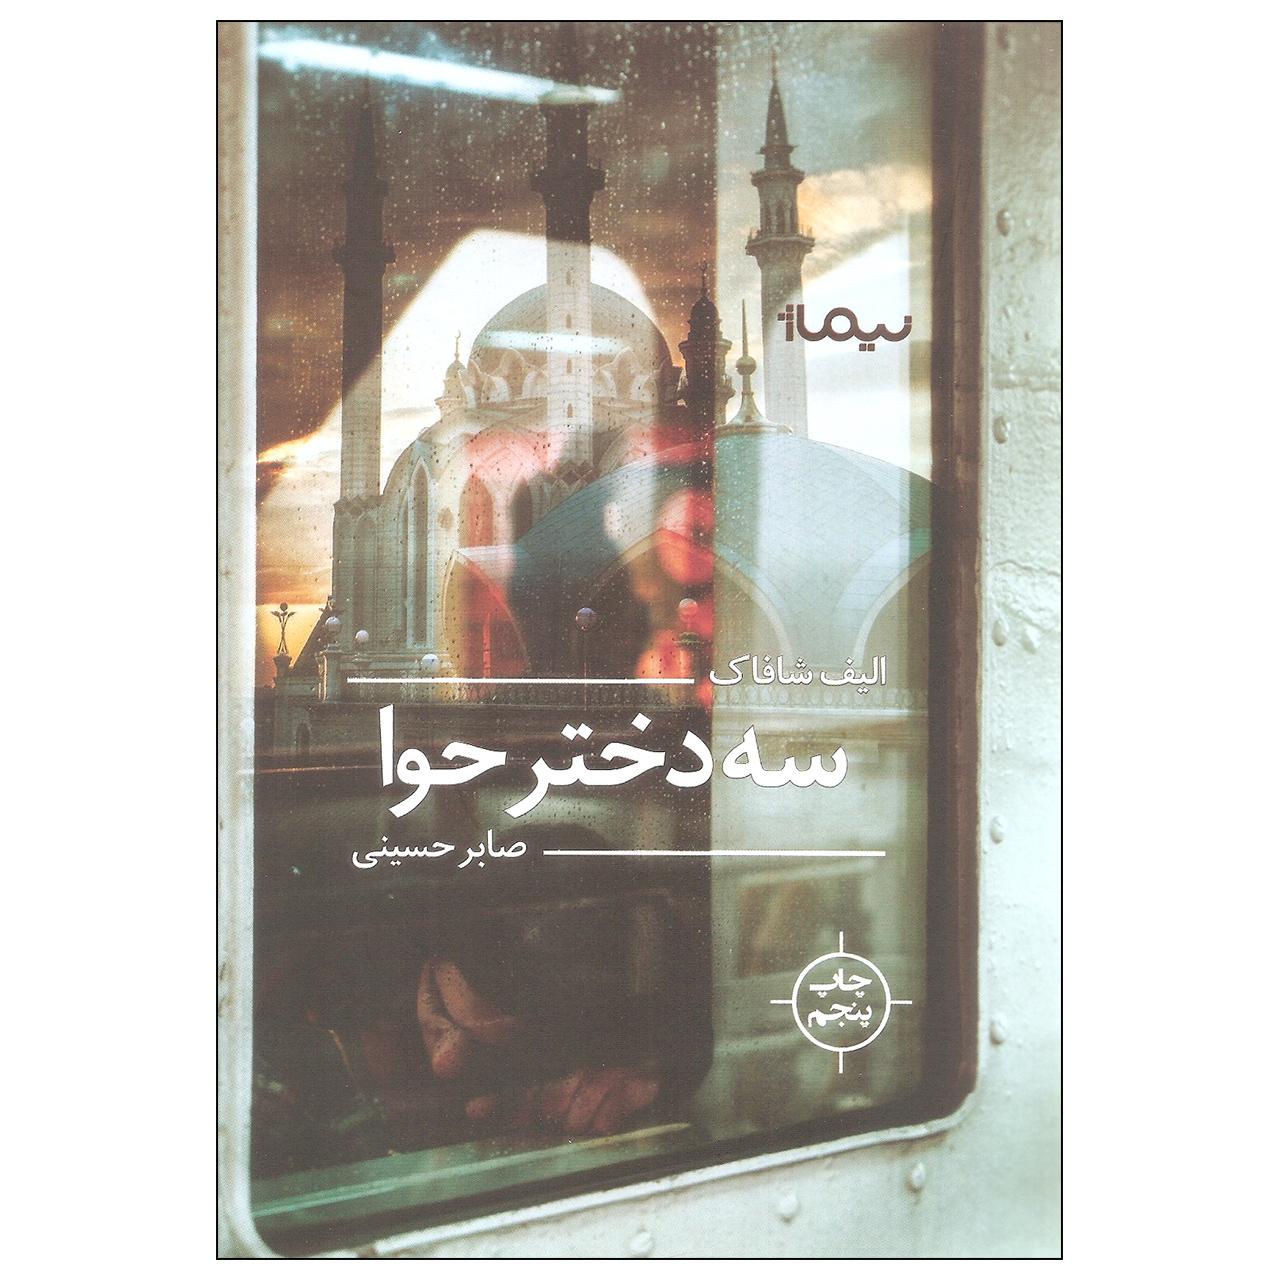 کتاب سه دختر حوا اثر الیف شافاک نشر نیماژ